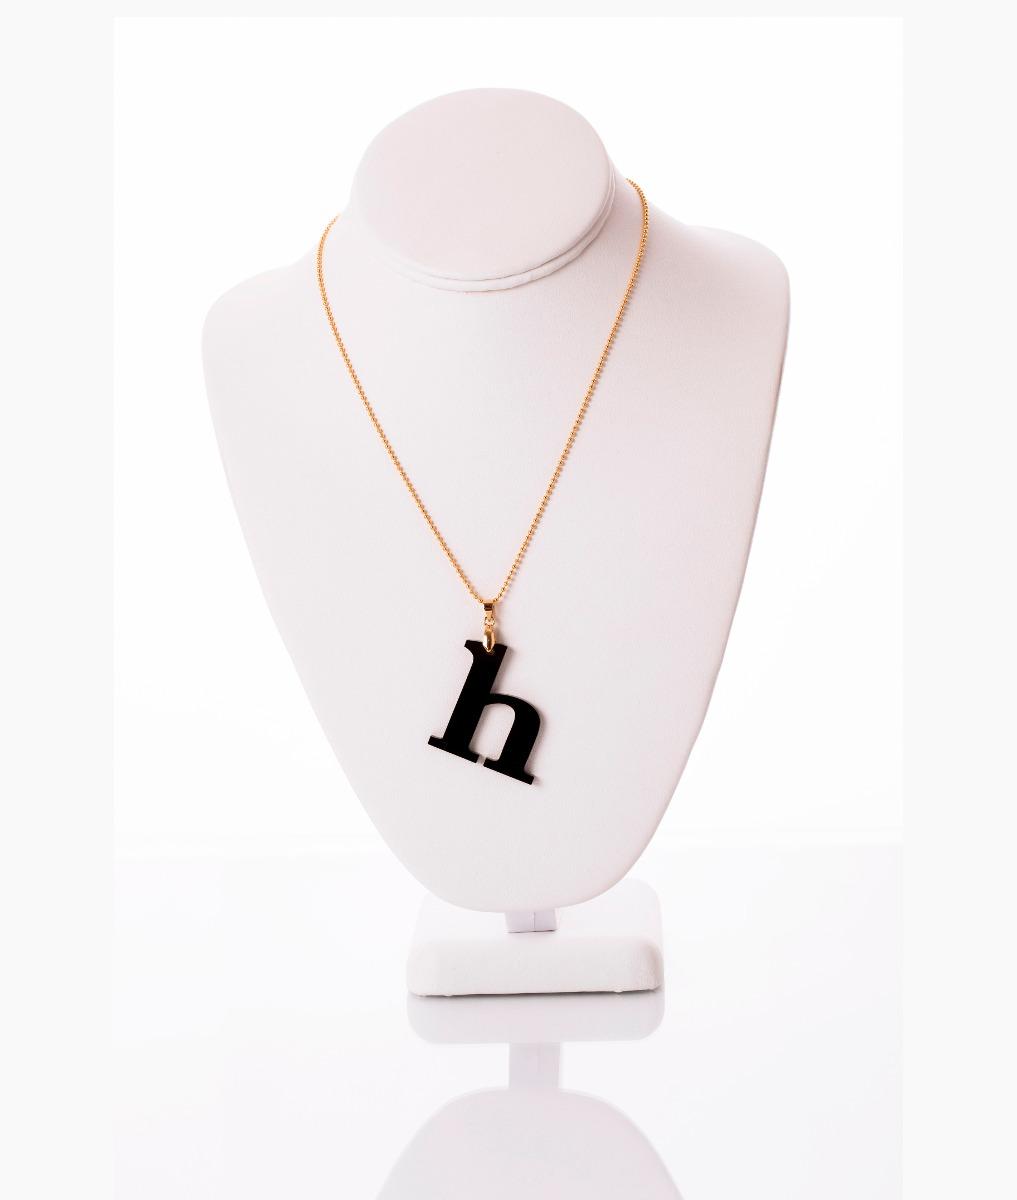 Collar van grieken letra h acrilico ba o de oro 18k - Bano de oro precio ...